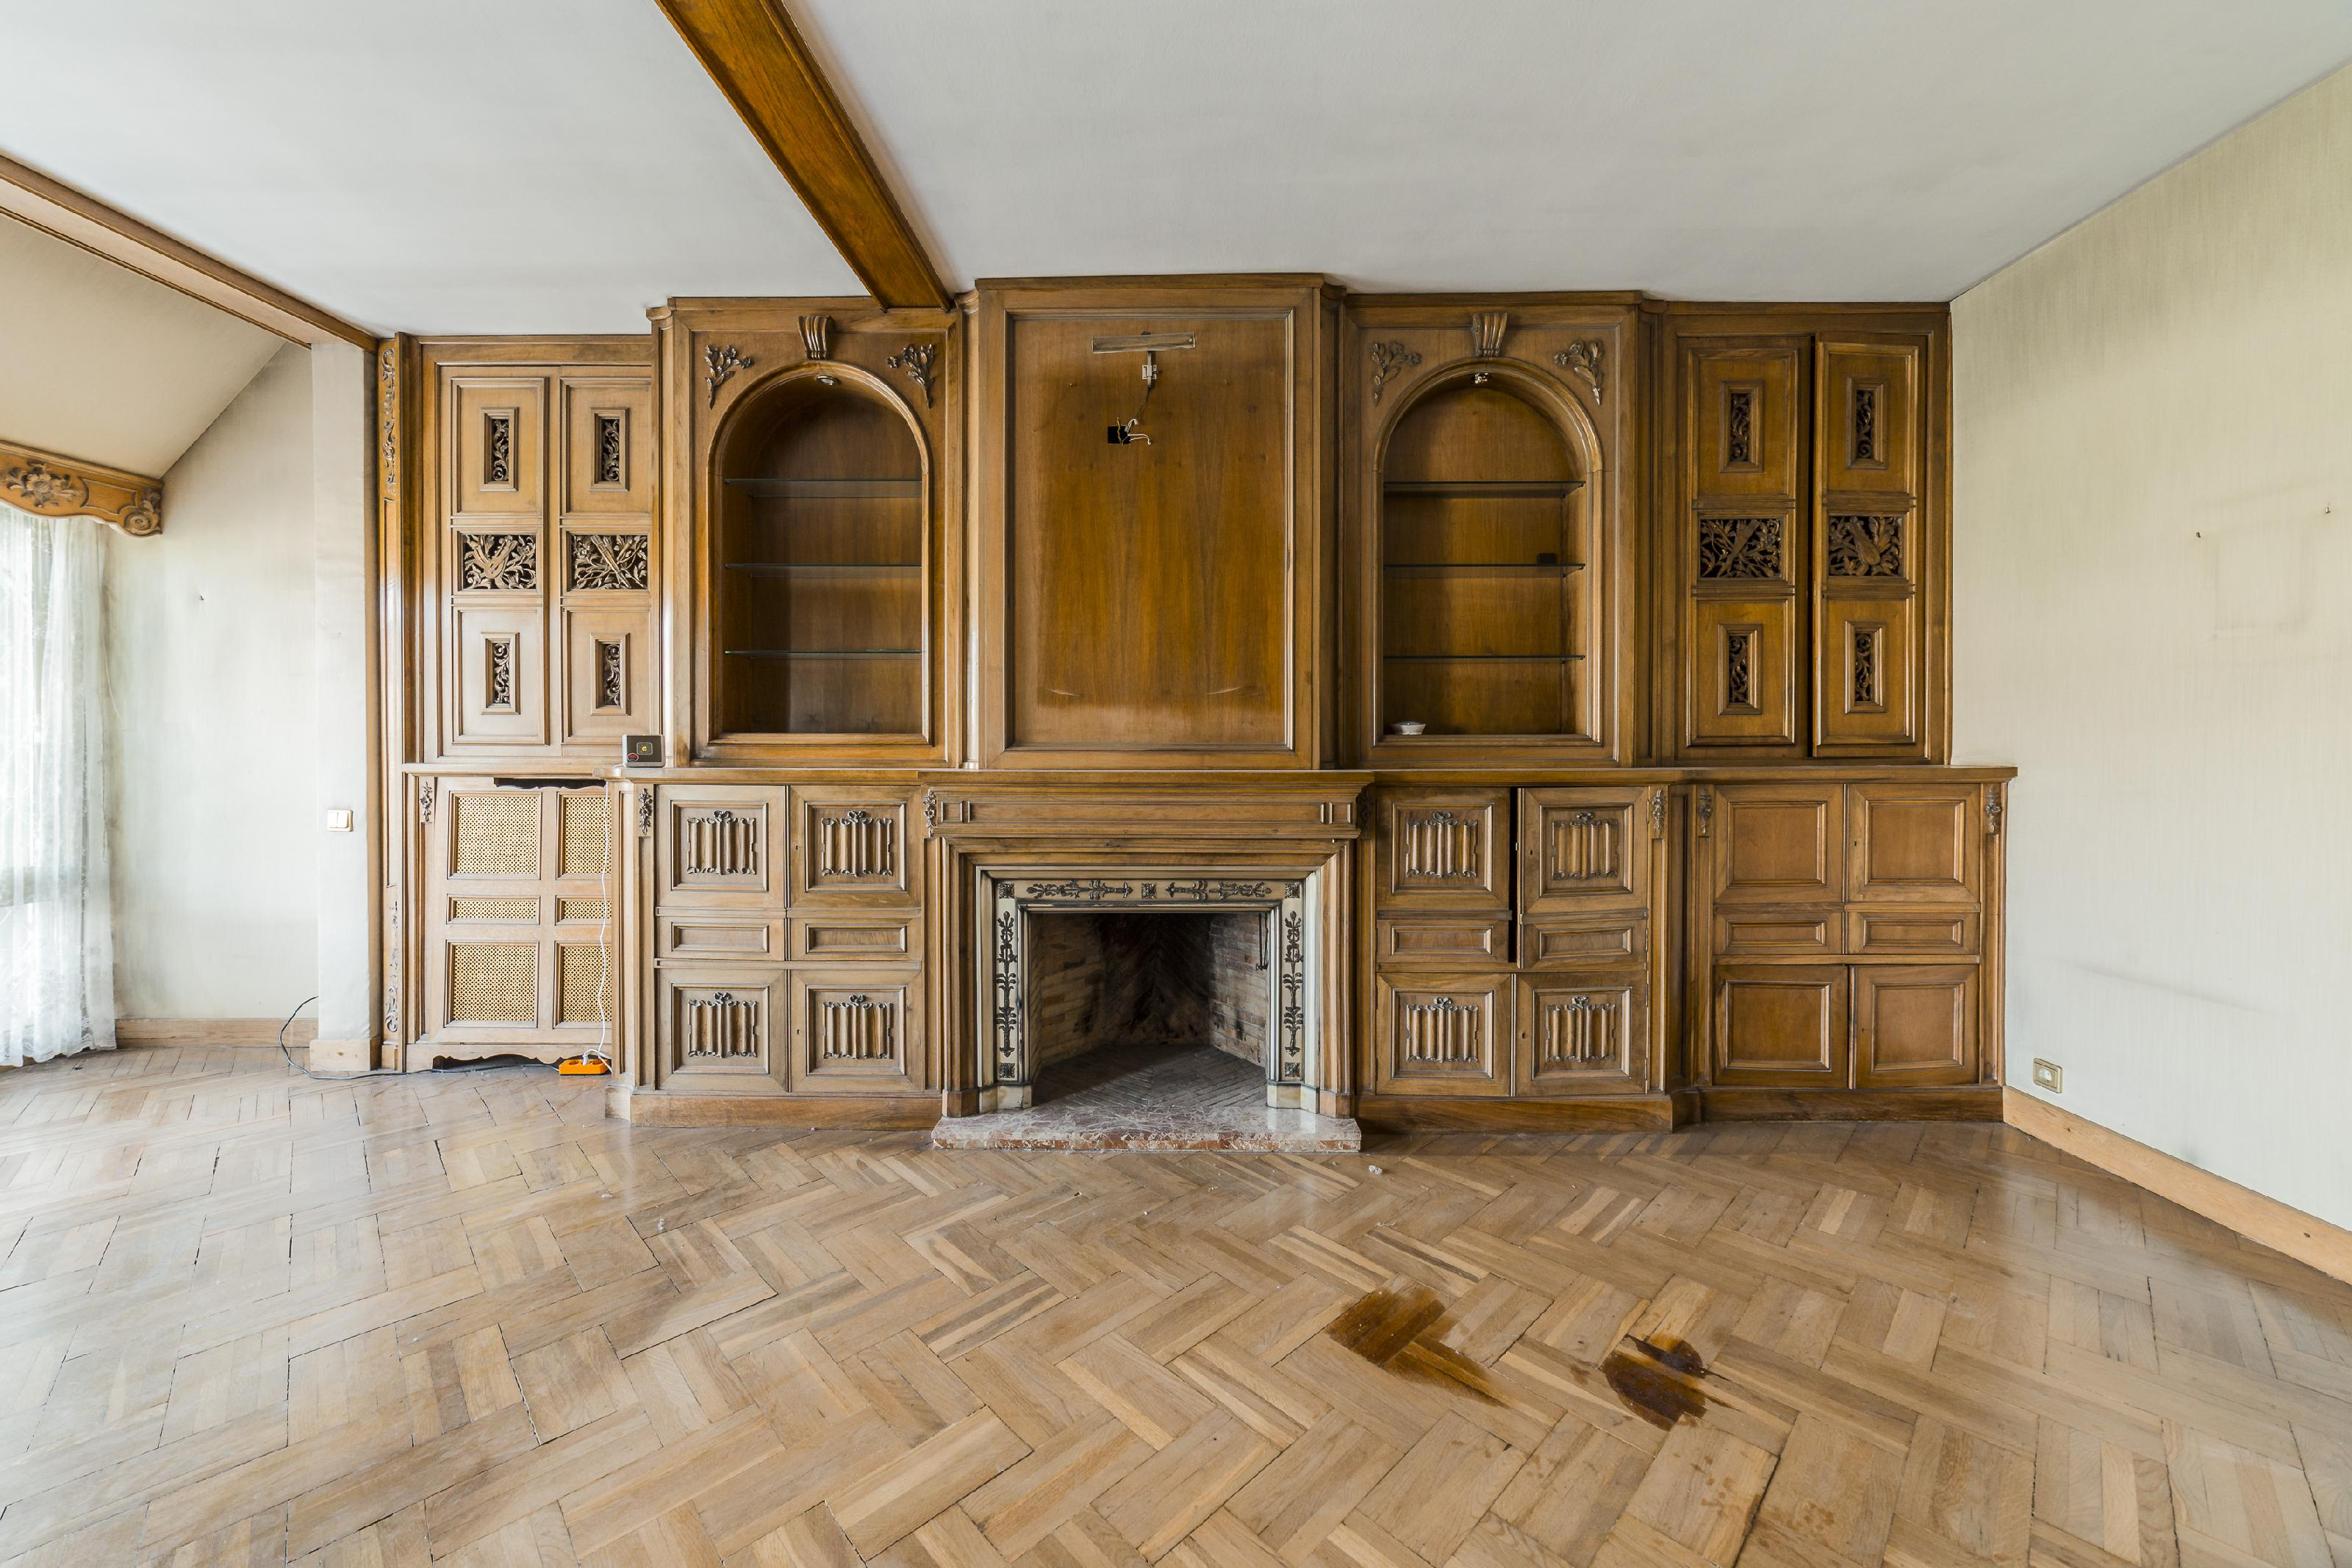 249314 Penthouse for sale in Sarrià-Sant Gervasi, Sant Gervasi-Galvany 14